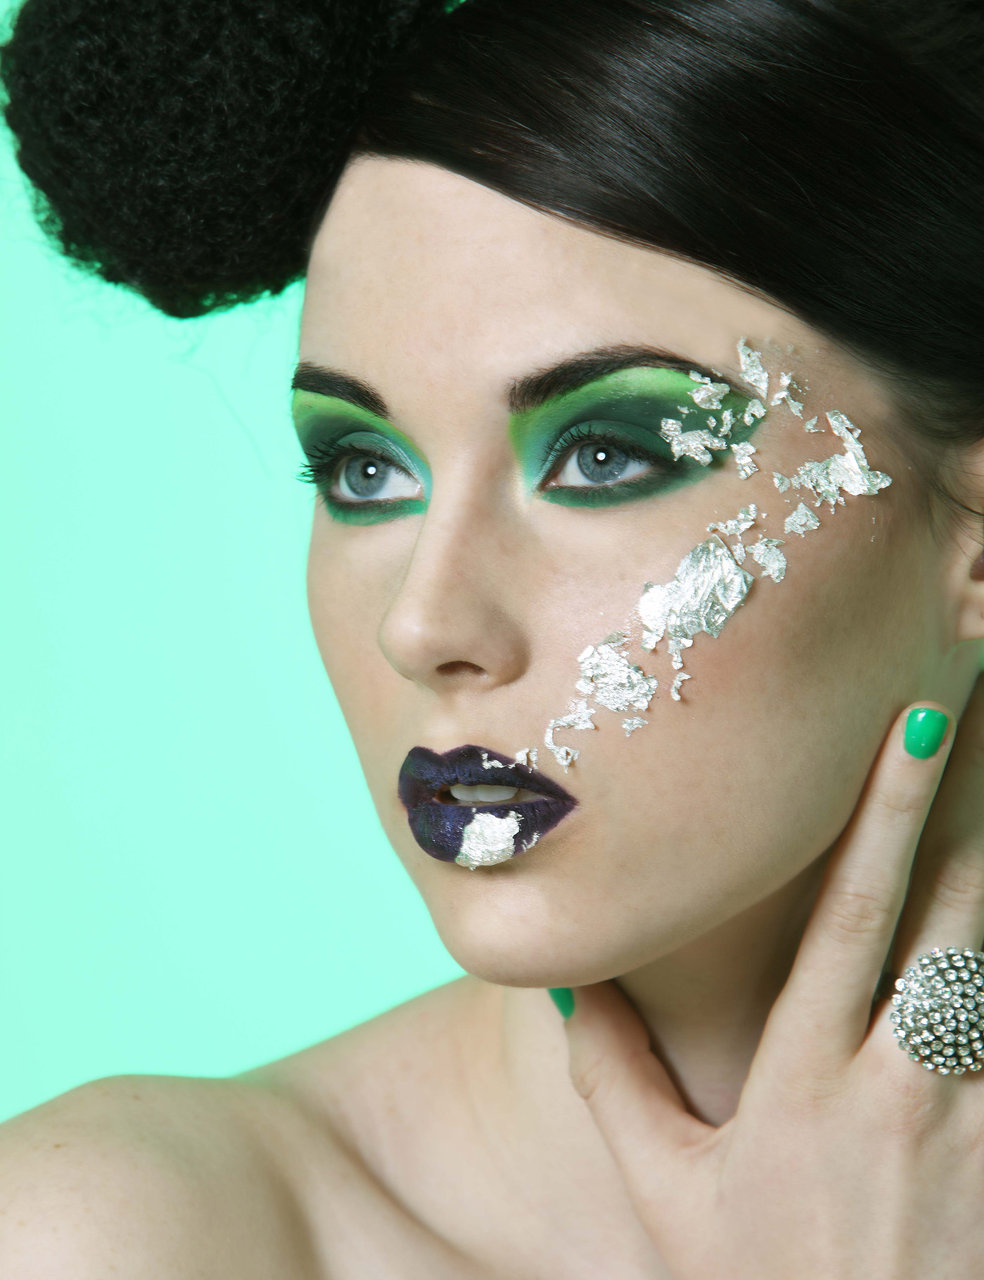 avant garde hair and makeup artist